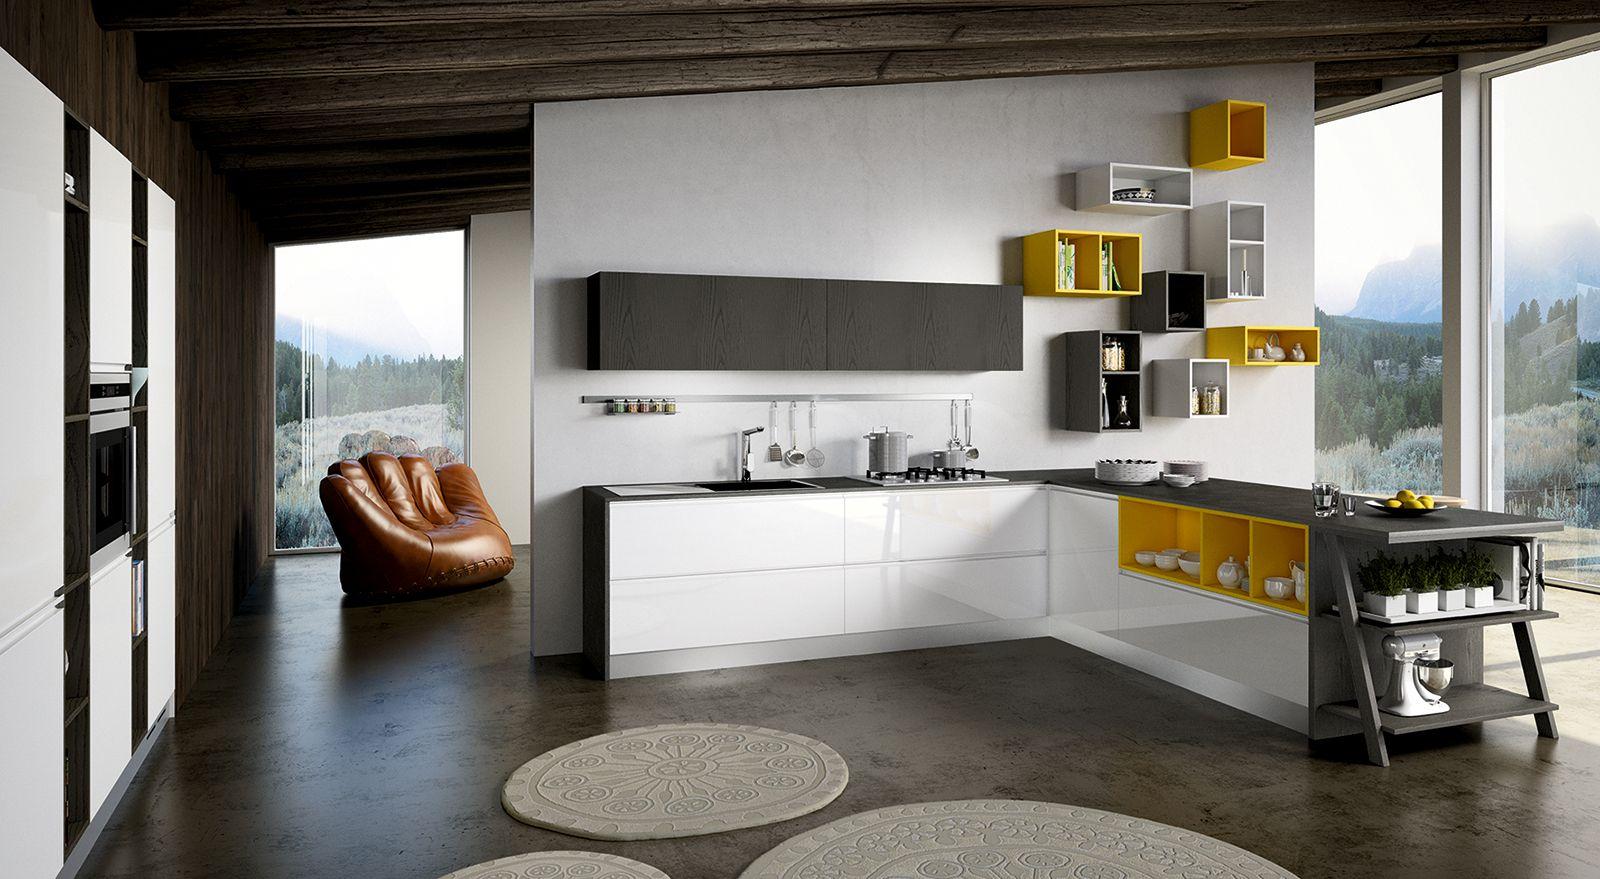 Beautiful Abbinamento Colori Cucina Images - Home Interior Ideas ...